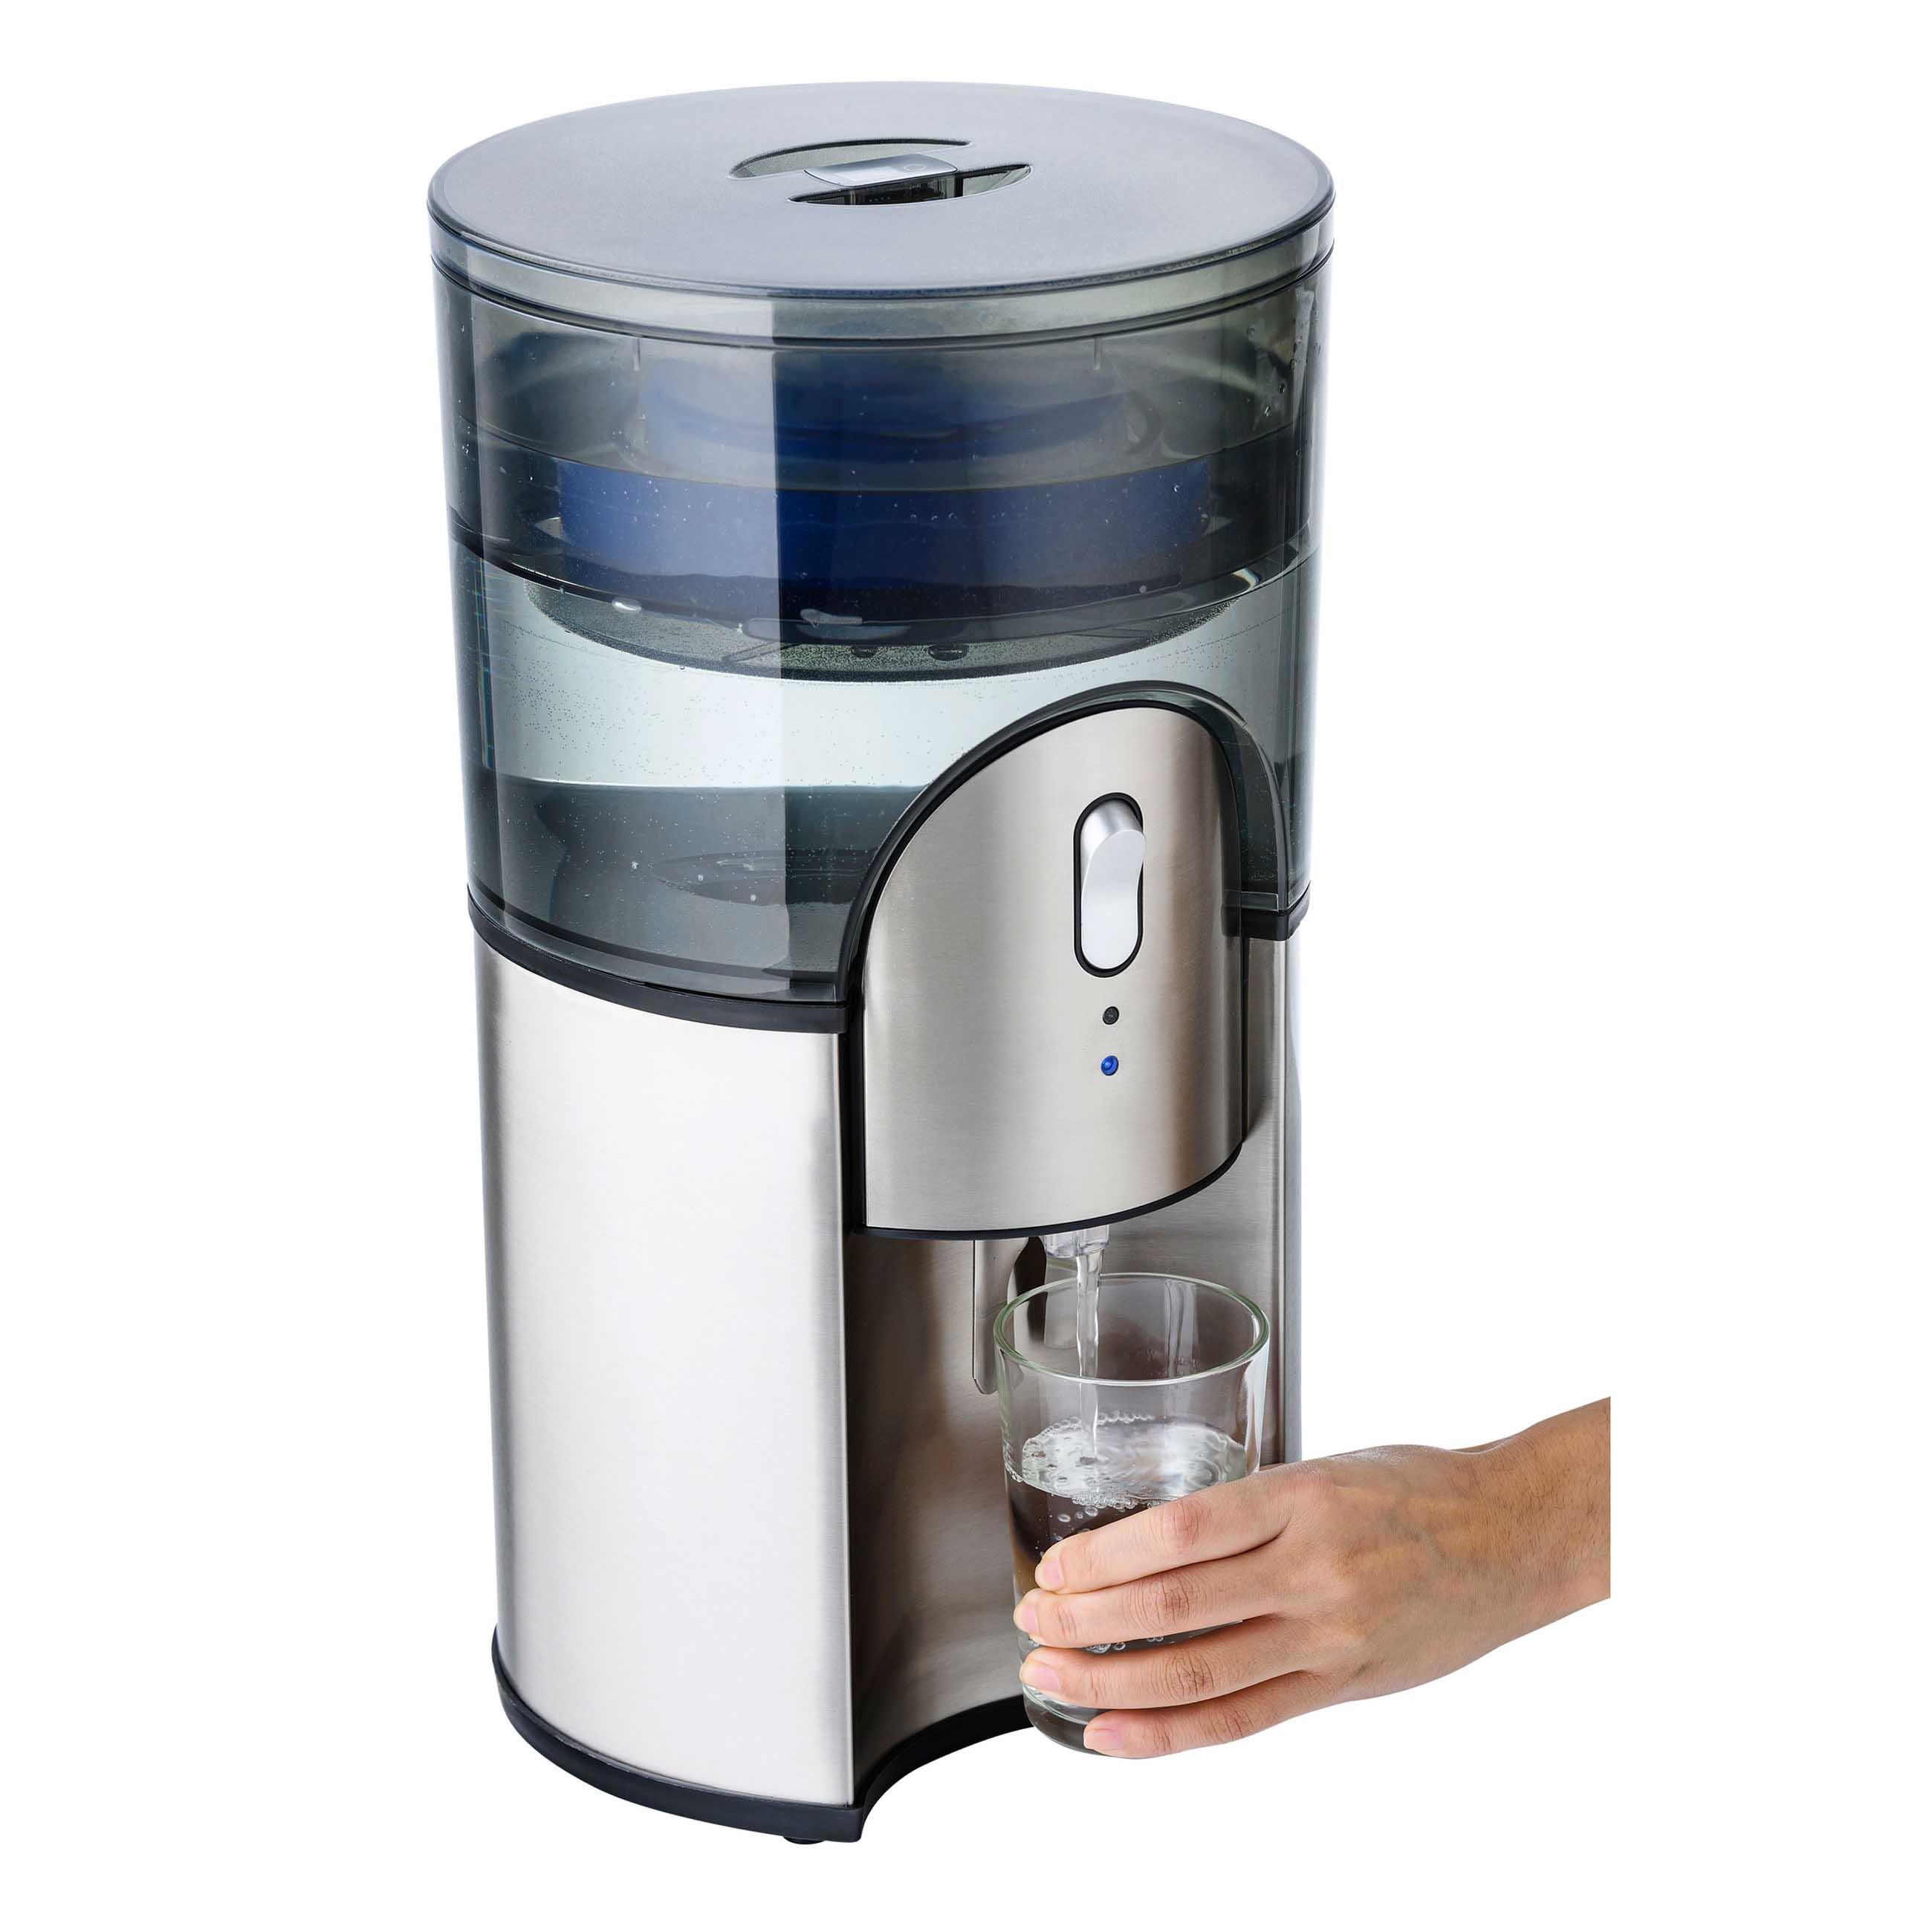 Desktop Water Cooler Stainless Steel